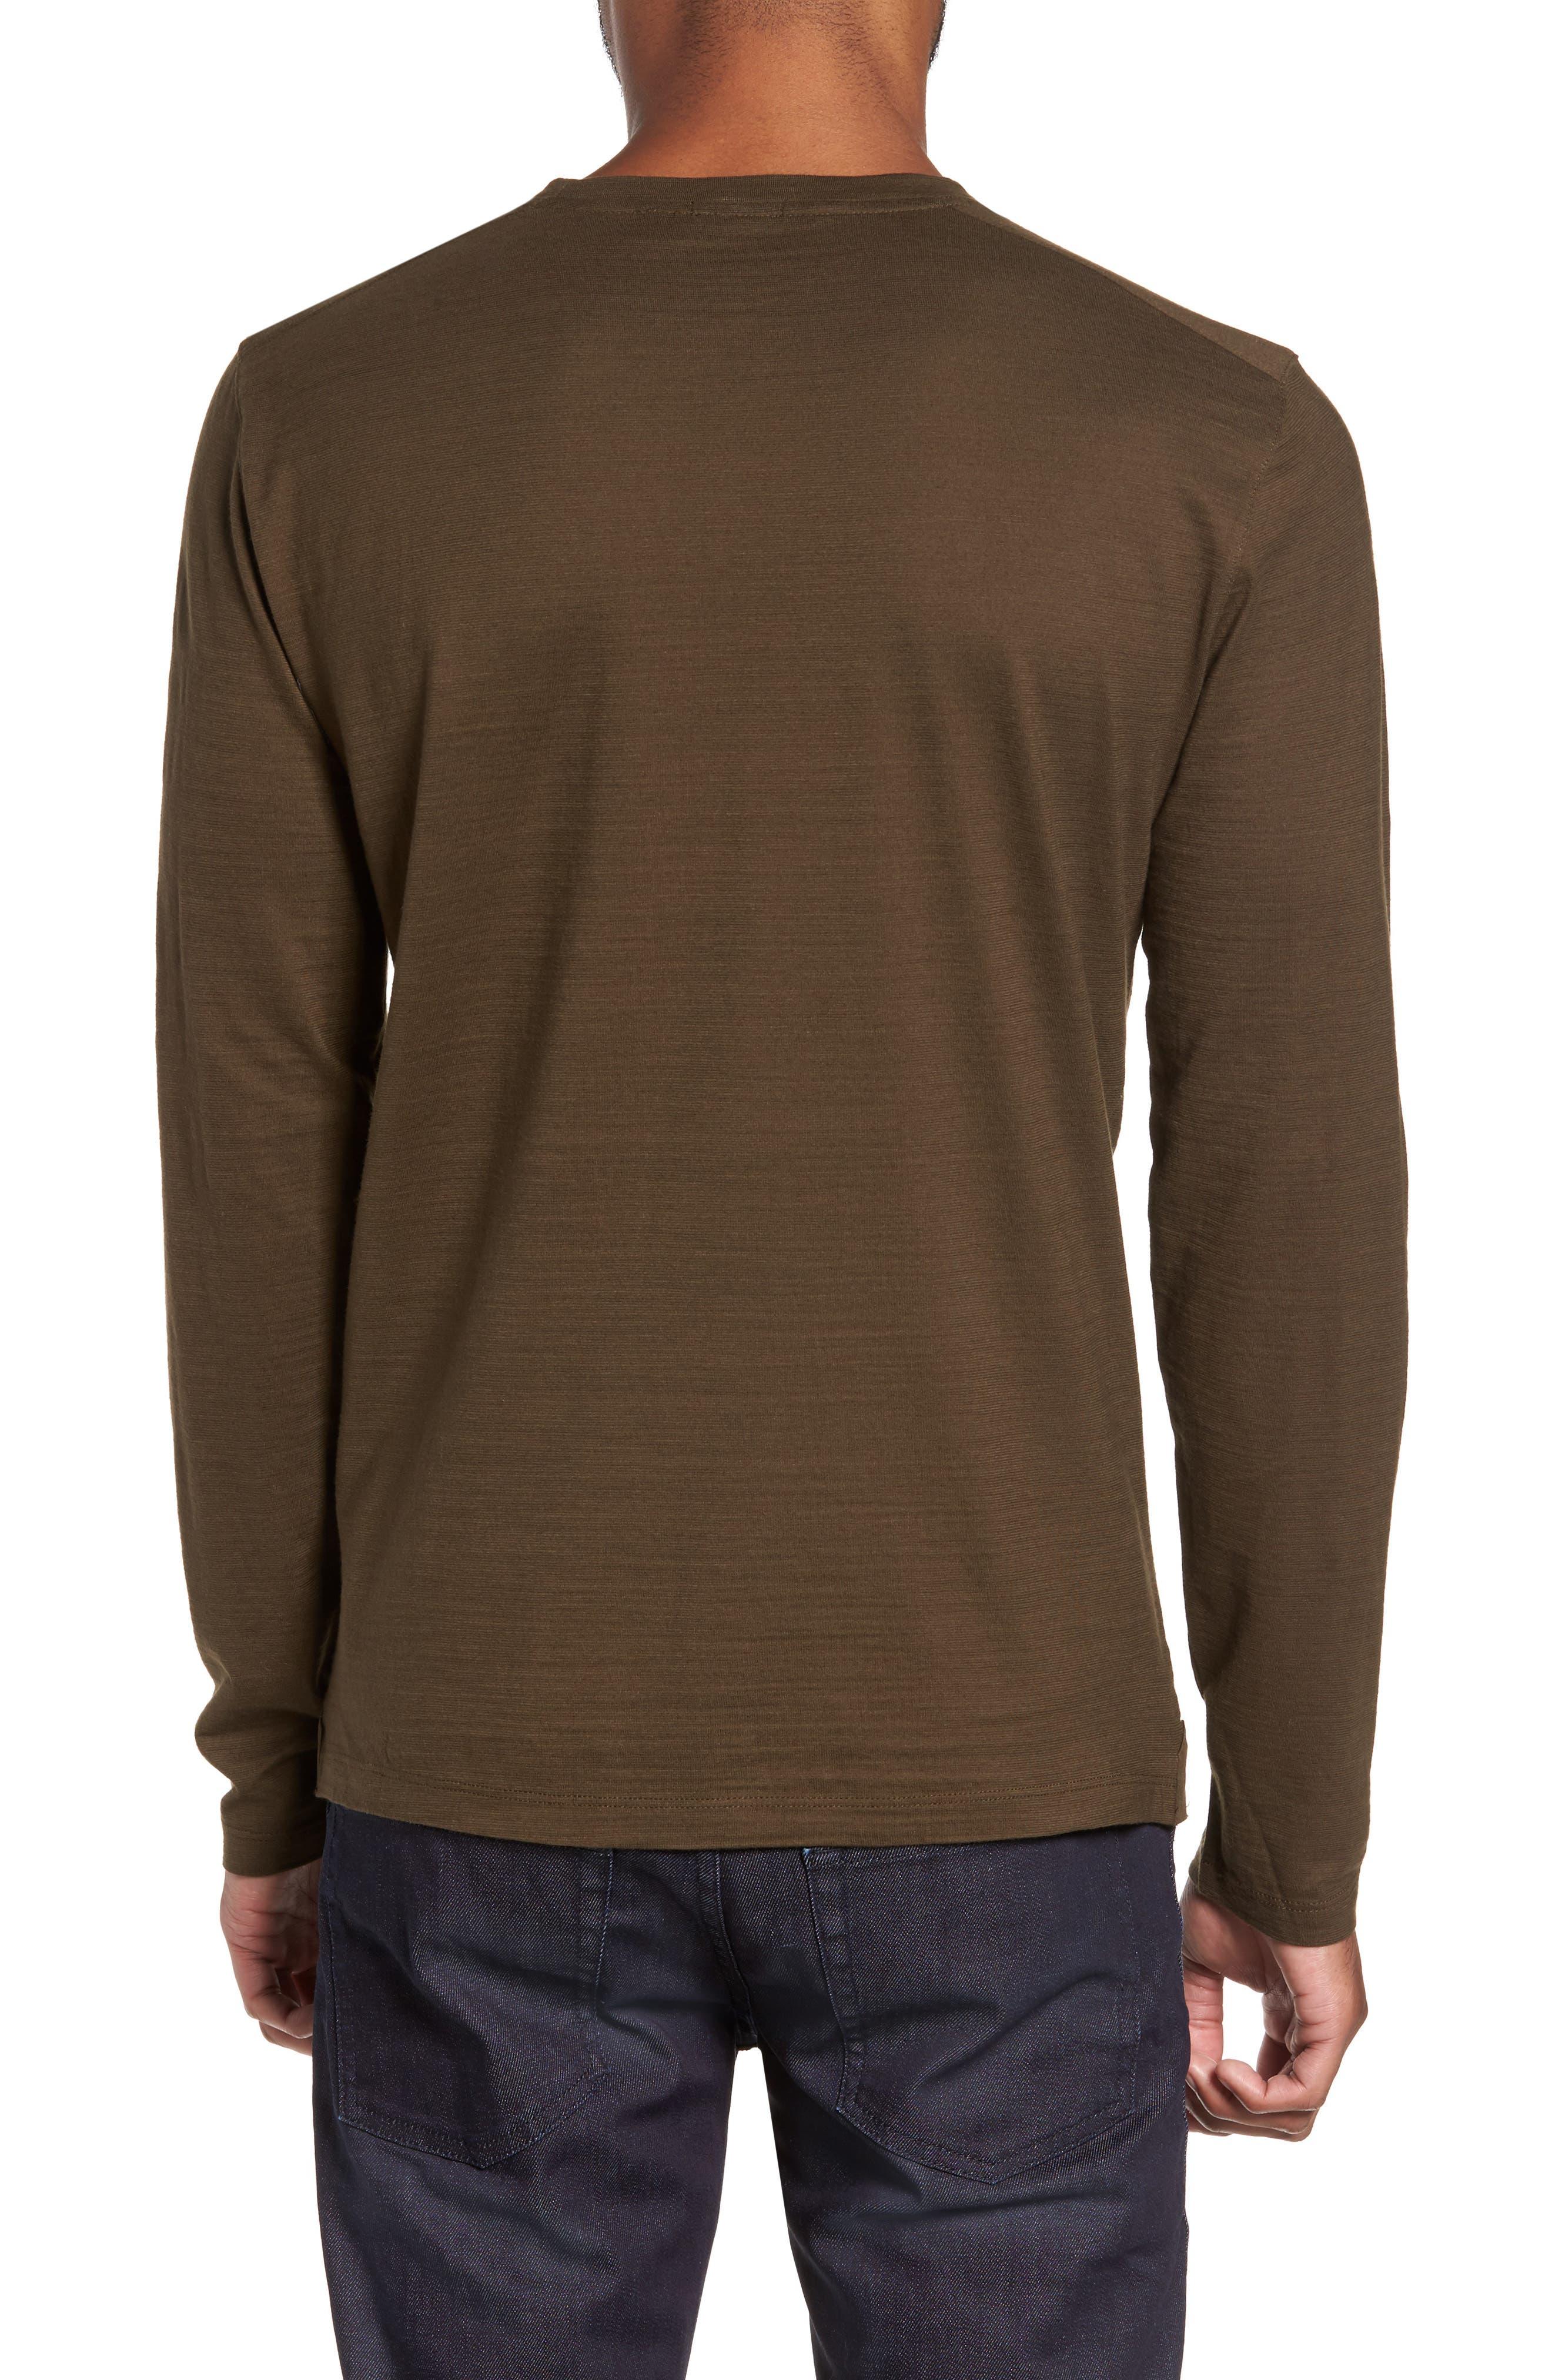 Tenison Long Sleeve T-Shirt,                             Alternate thumbnail 2, color,                             Olive